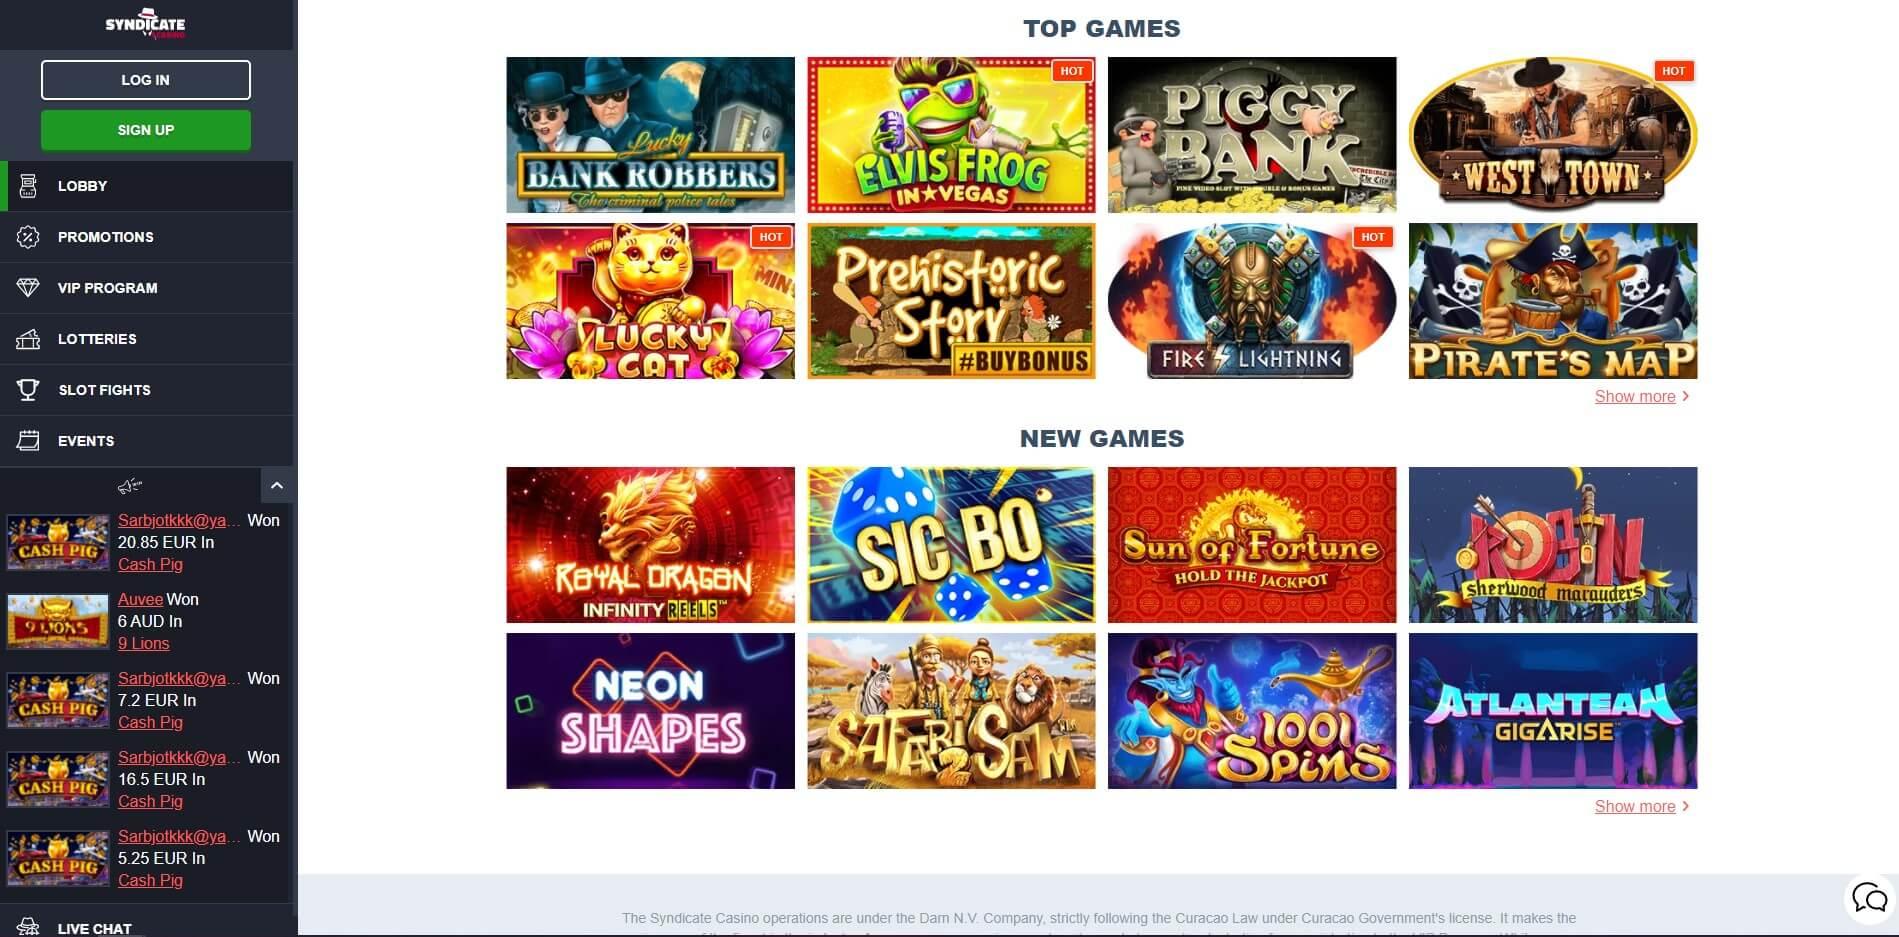 Syndicate Casino Games Screenshot